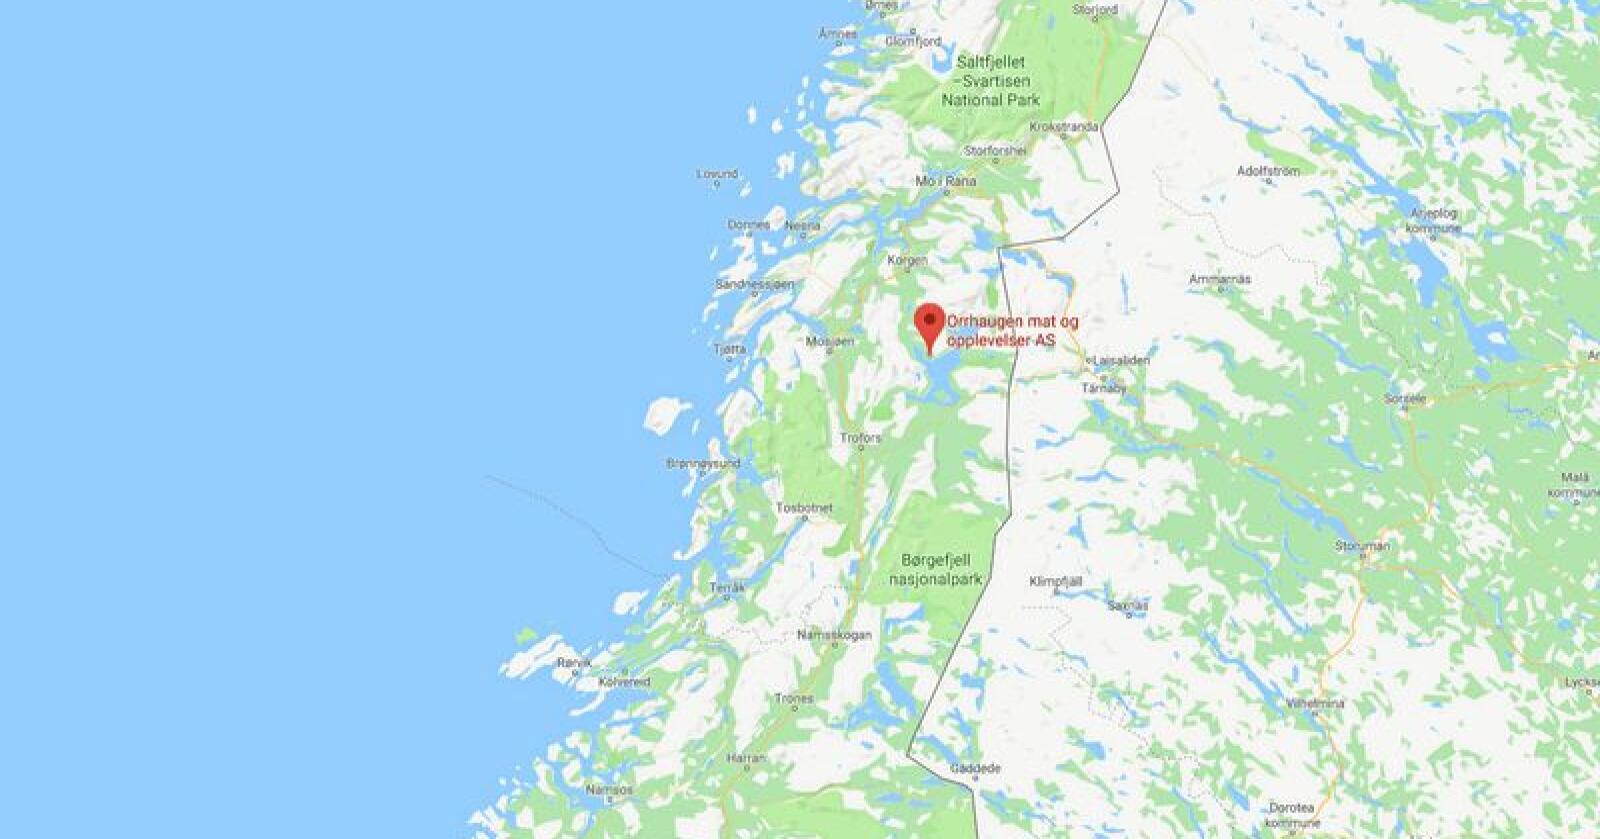 Orrhaugen gård ligger på Hemnes i Nordland. Skjermdump: Google Maps